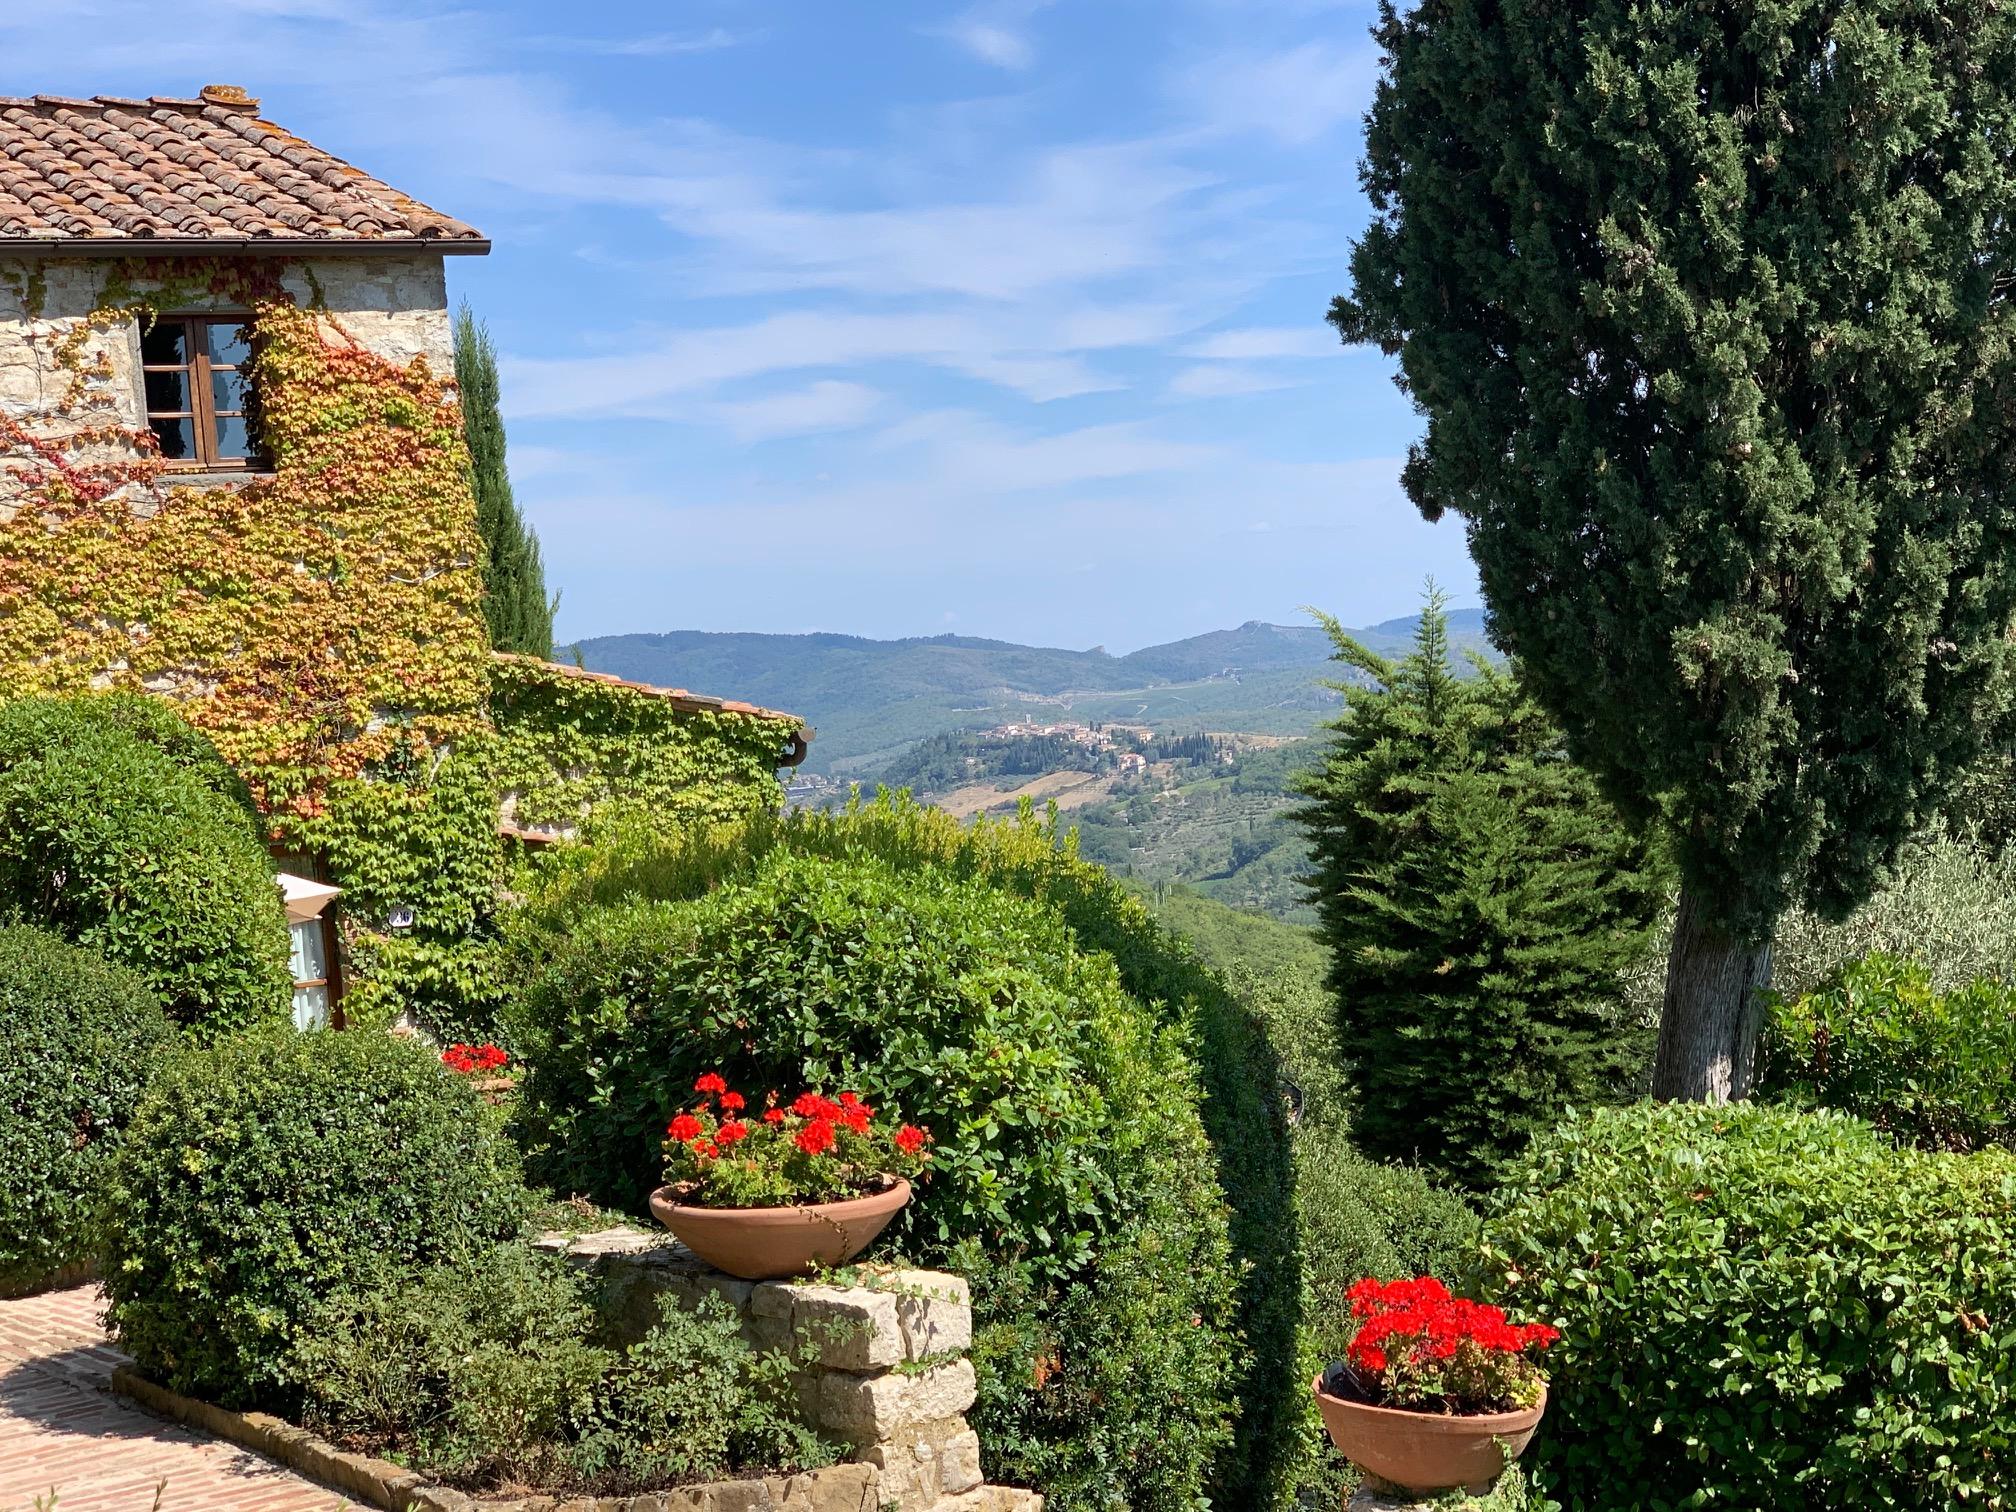 Umbria mia Tour 10 | Toskana pur – Chianti-Valdarno-Maremma! | Juni/Juli 2022